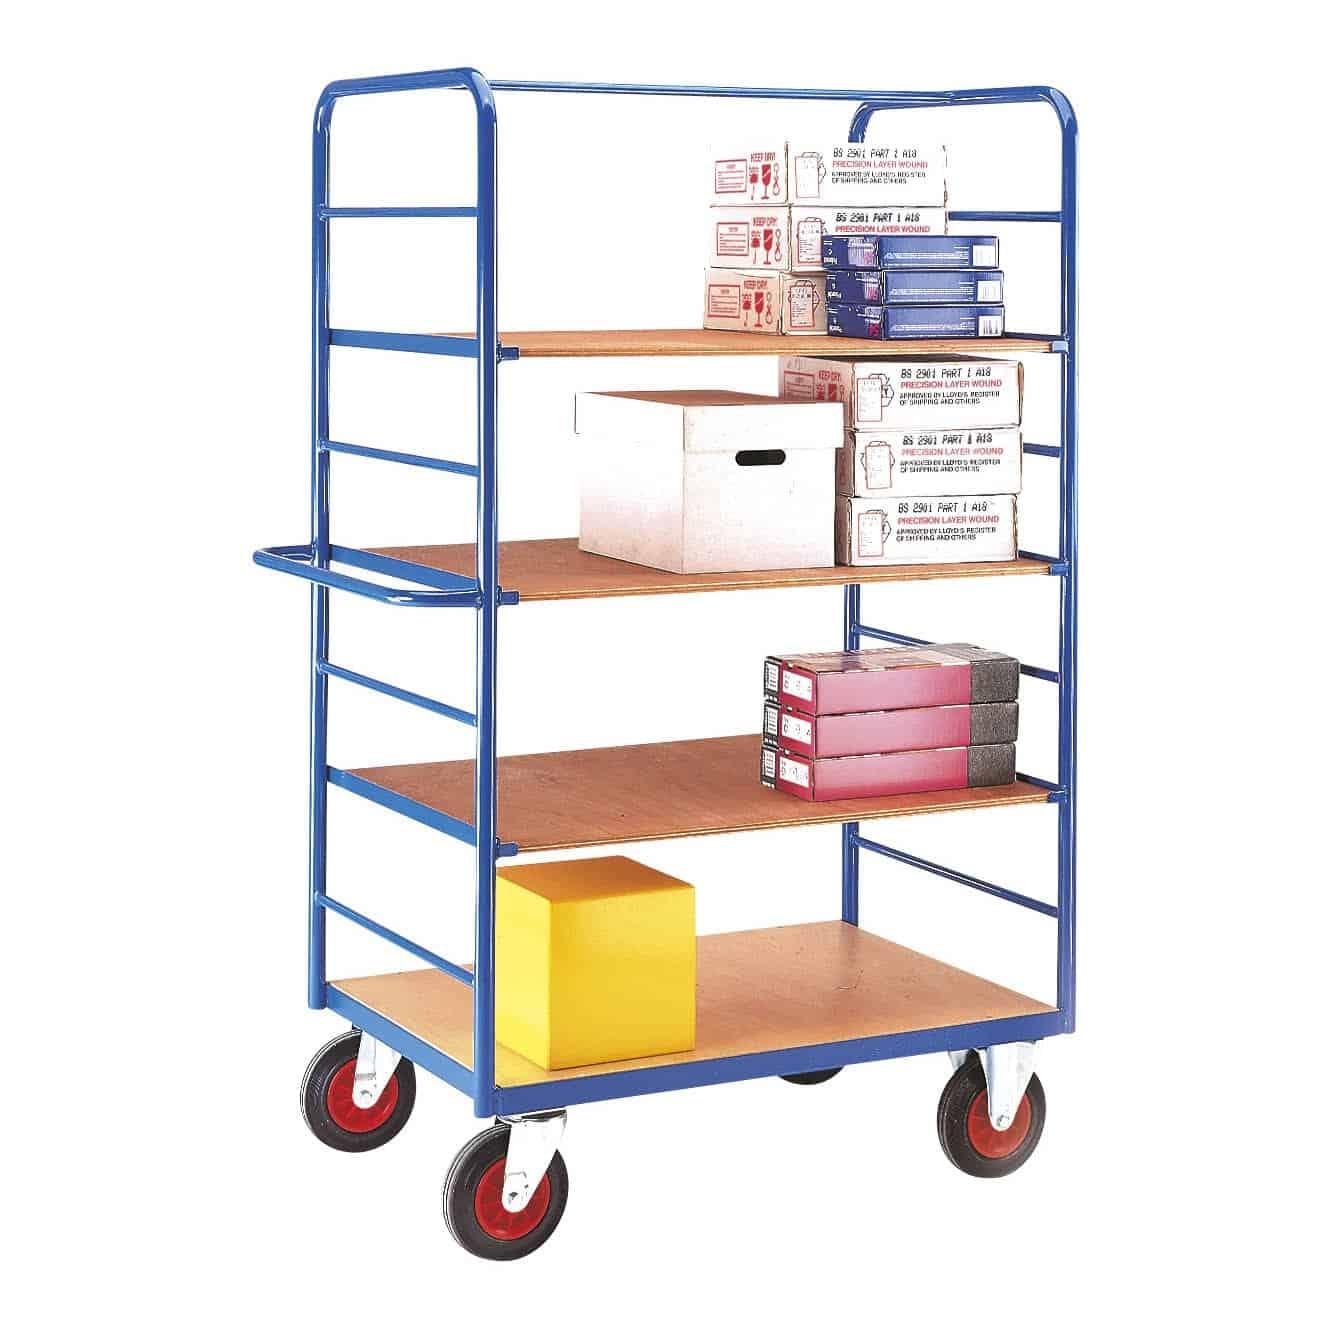 Standard Fixed Ply Platform Shelf Trucks